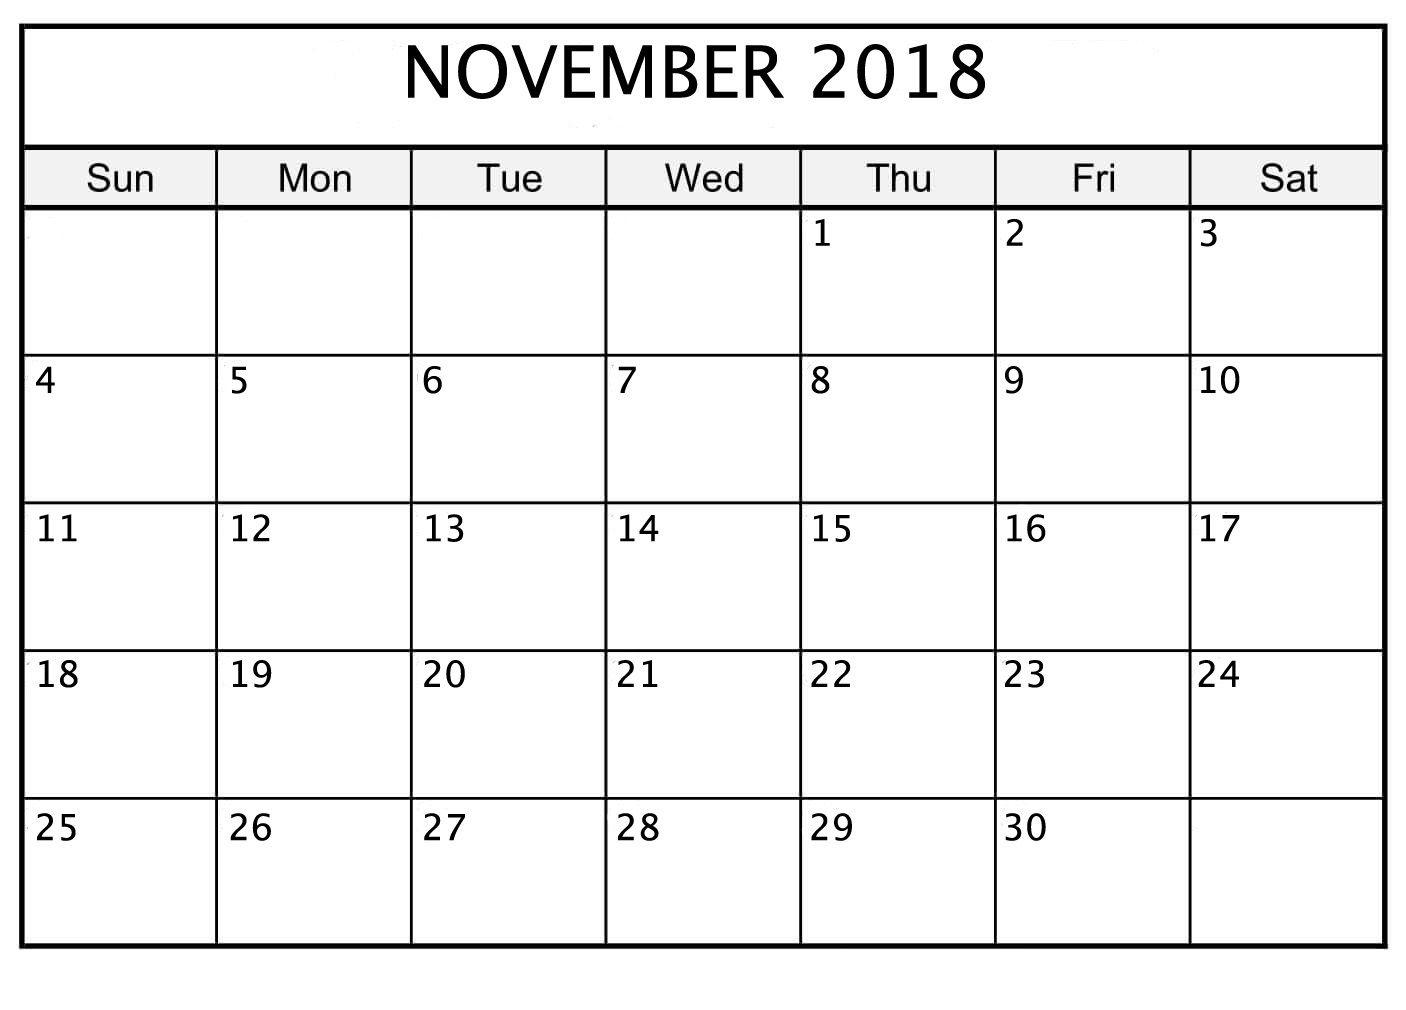 Free Calendar Design November 2018 Printable | November 2018 with Nov Calendar Printable Template